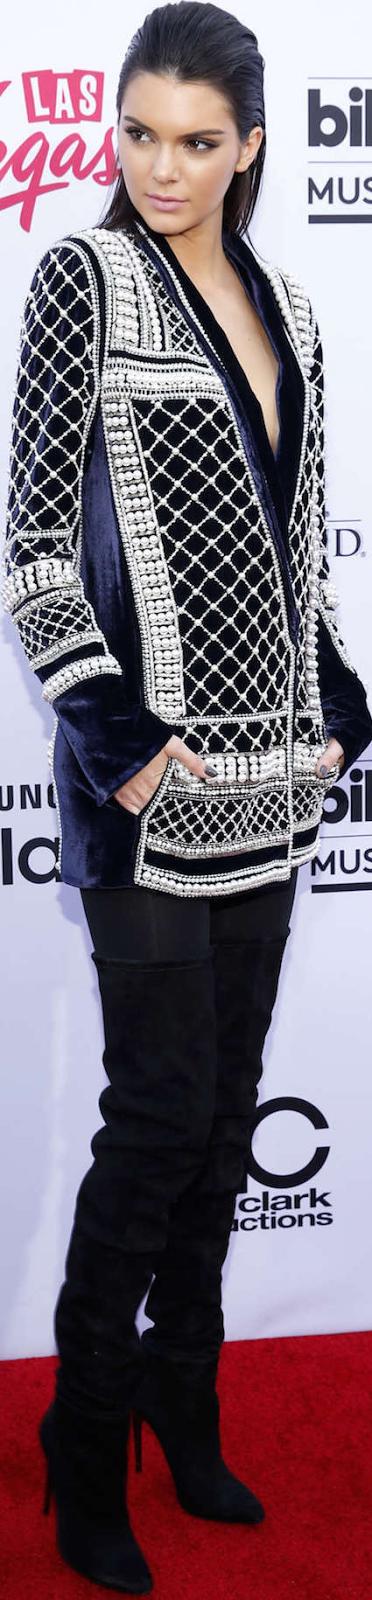 2015 Billboard Awards Kendall Jenner